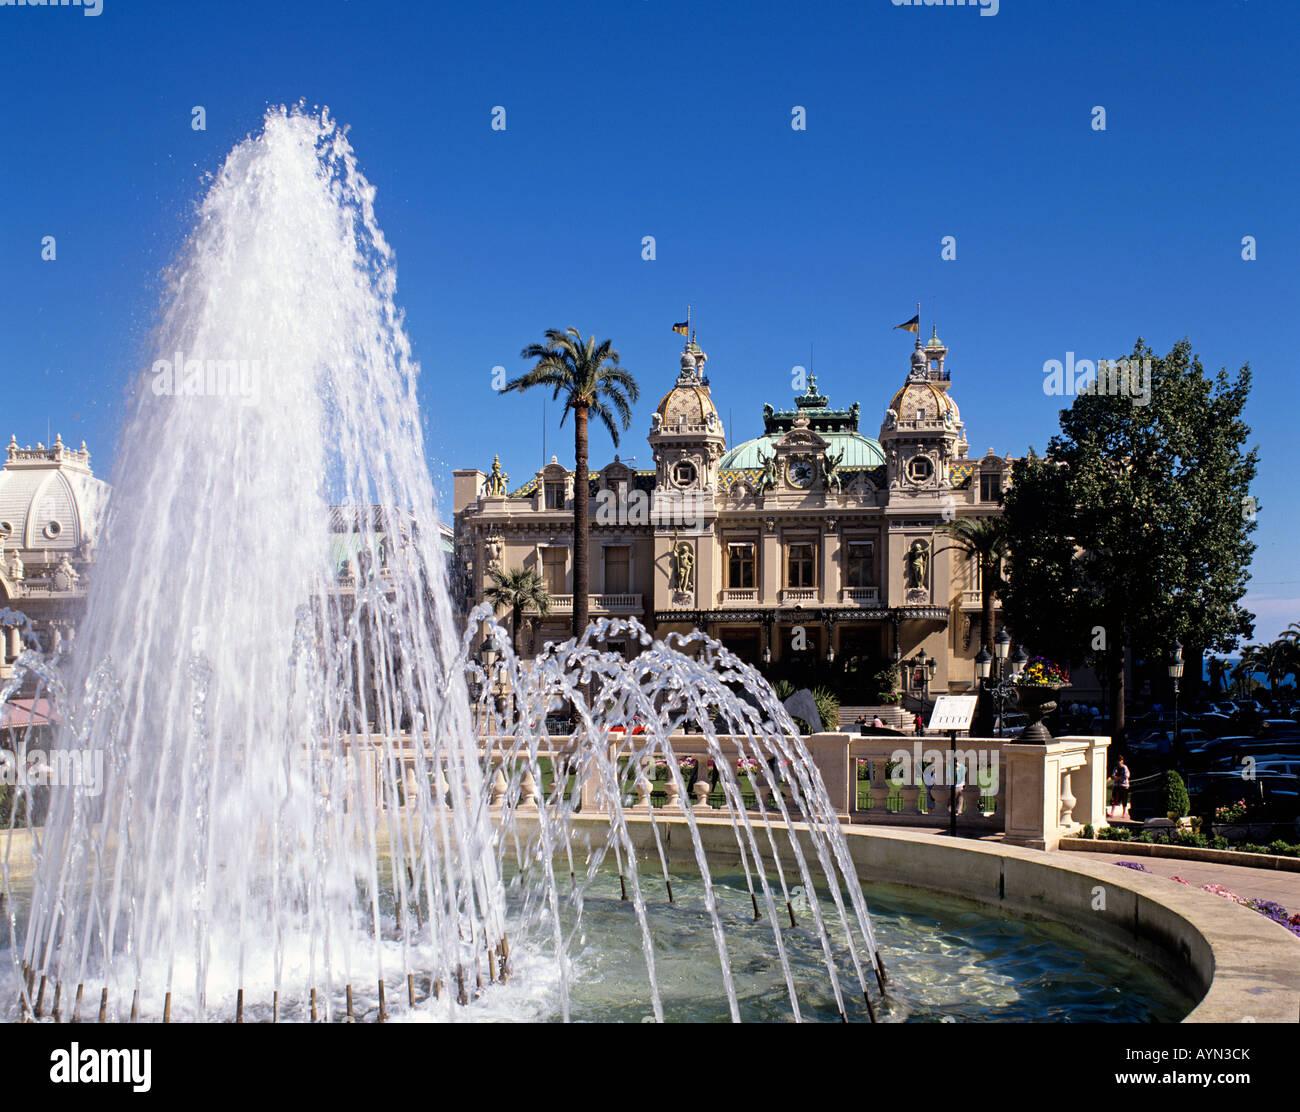 Europa Europe Cote D Azur Monaco Monte Carlo Casino Kasino Stock Photo